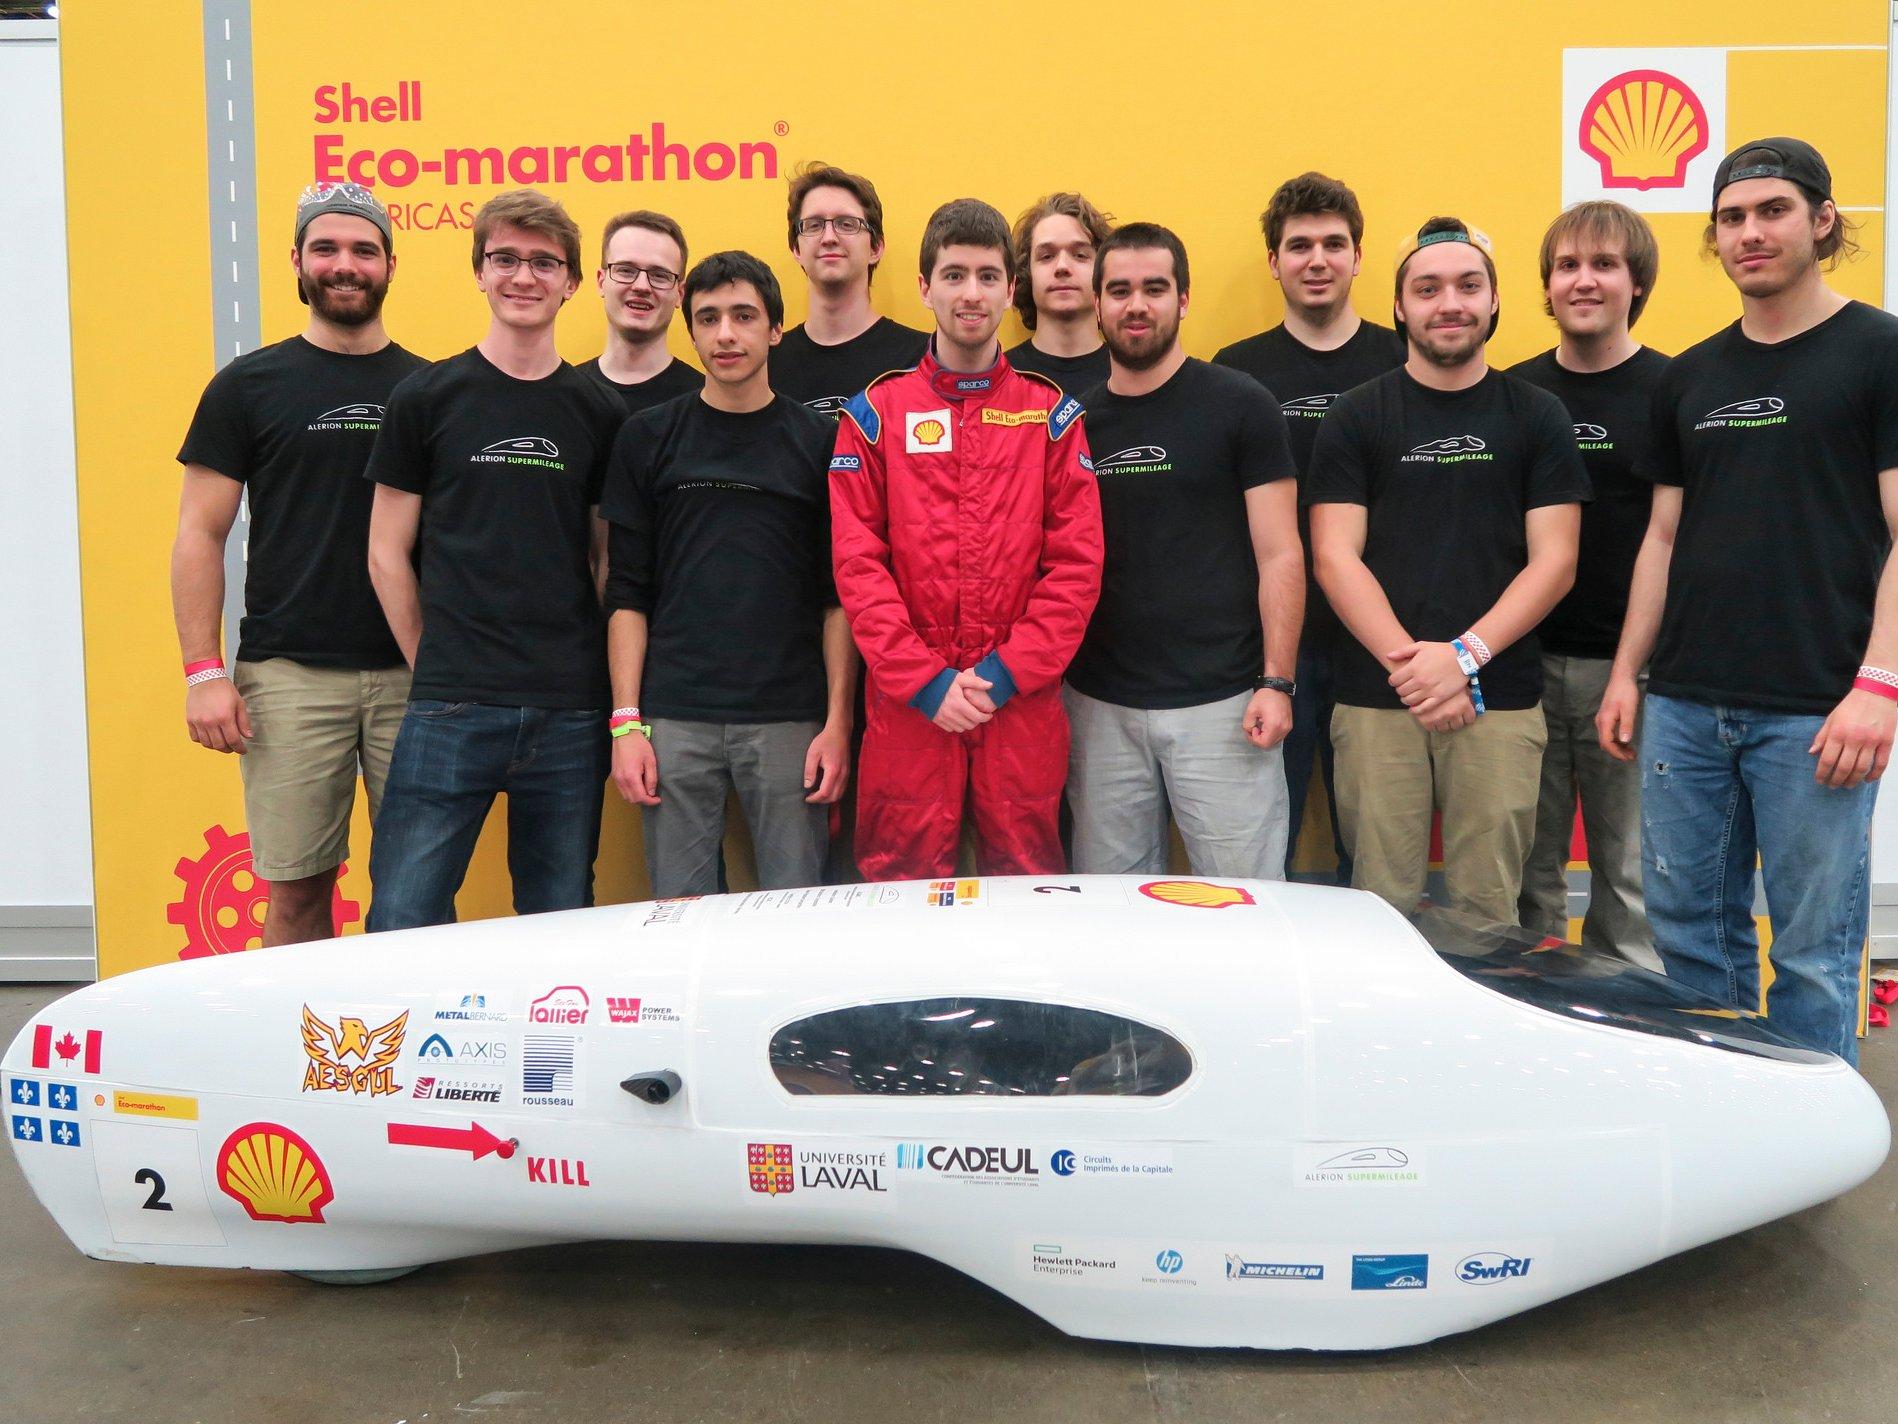 maraton shell eco